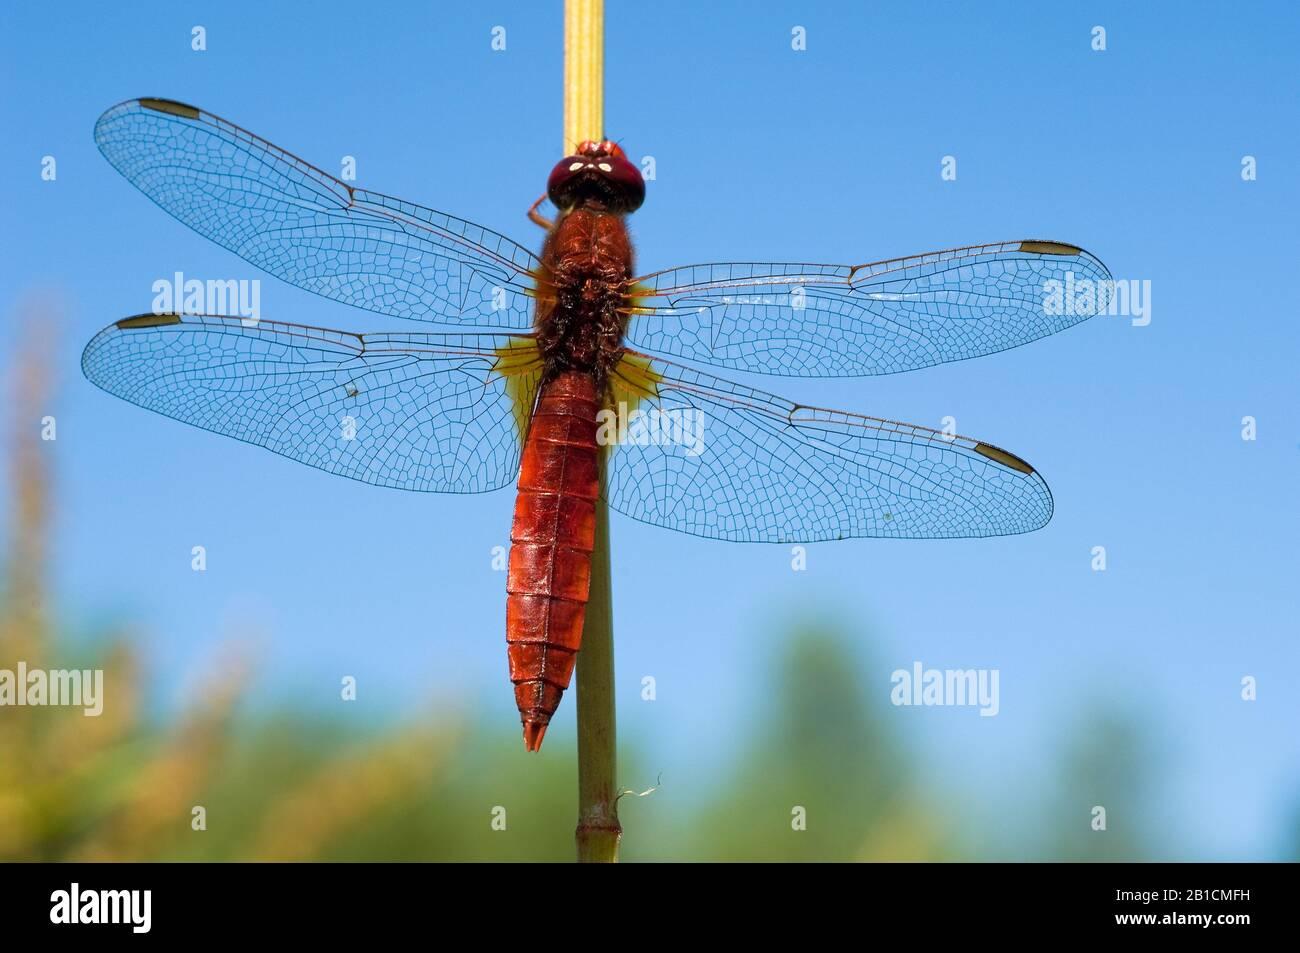 Broad Scarlet, Common Scarlet-darter, Scarlet Darter, Scarlet Dragonfly (Crocothemis erythraea, Croccothemis erythraea), male, Netherlands, Limburg, Stock Photo